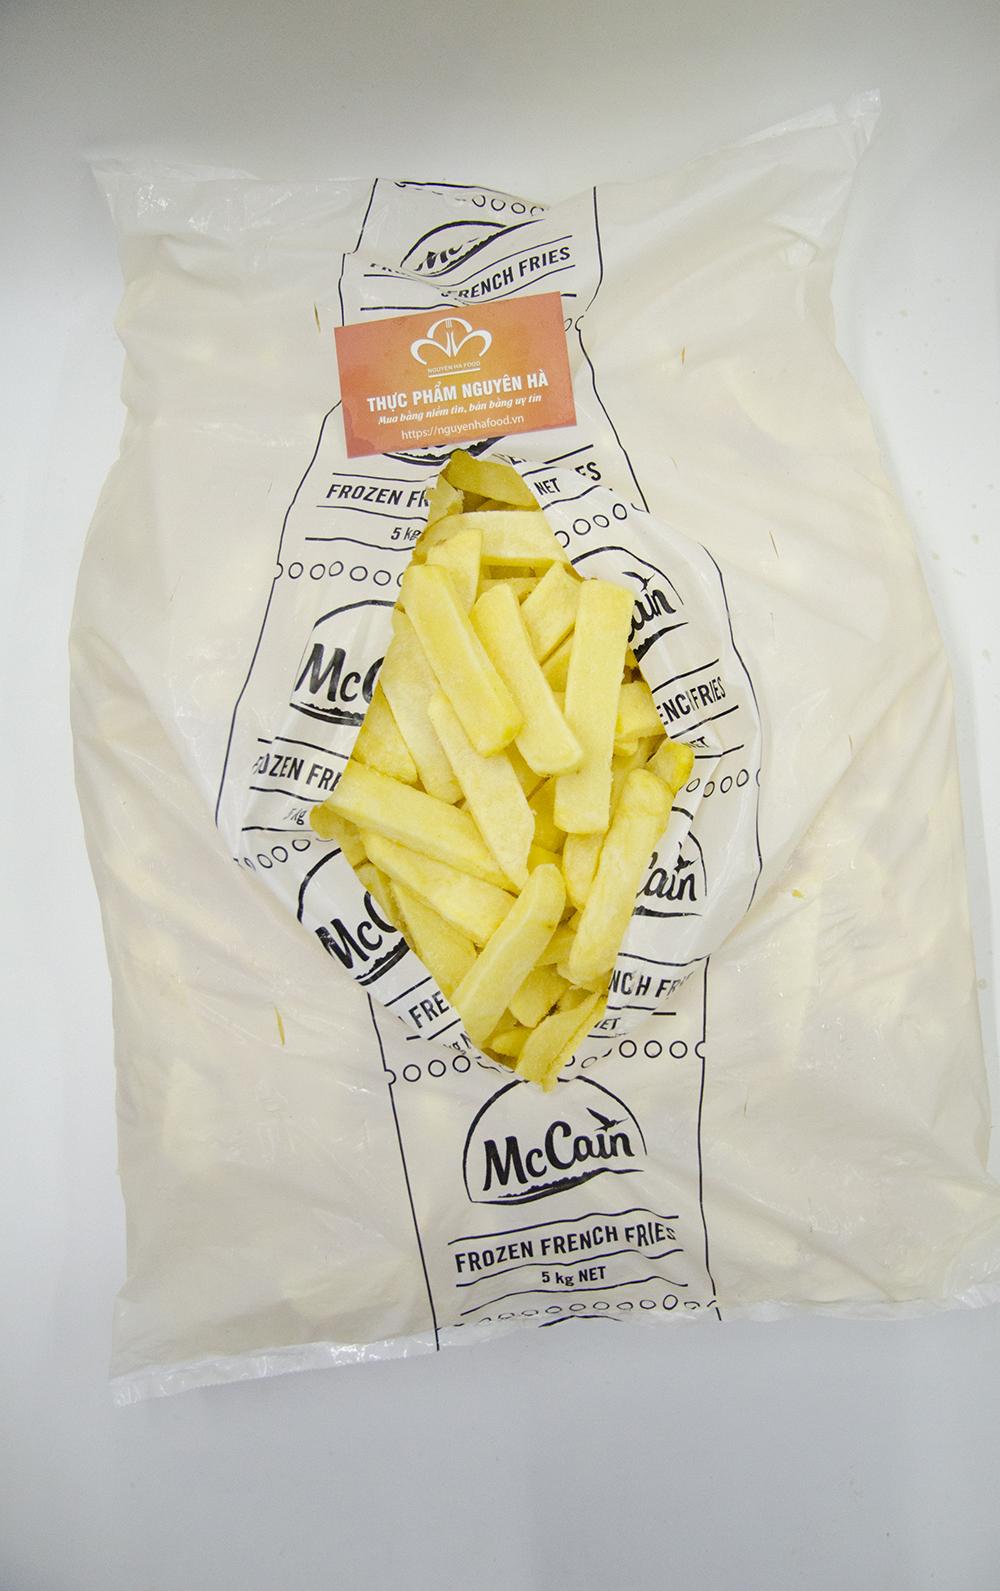 Khoai tây ¾ Steak House Mc Cain (5kg/bao)